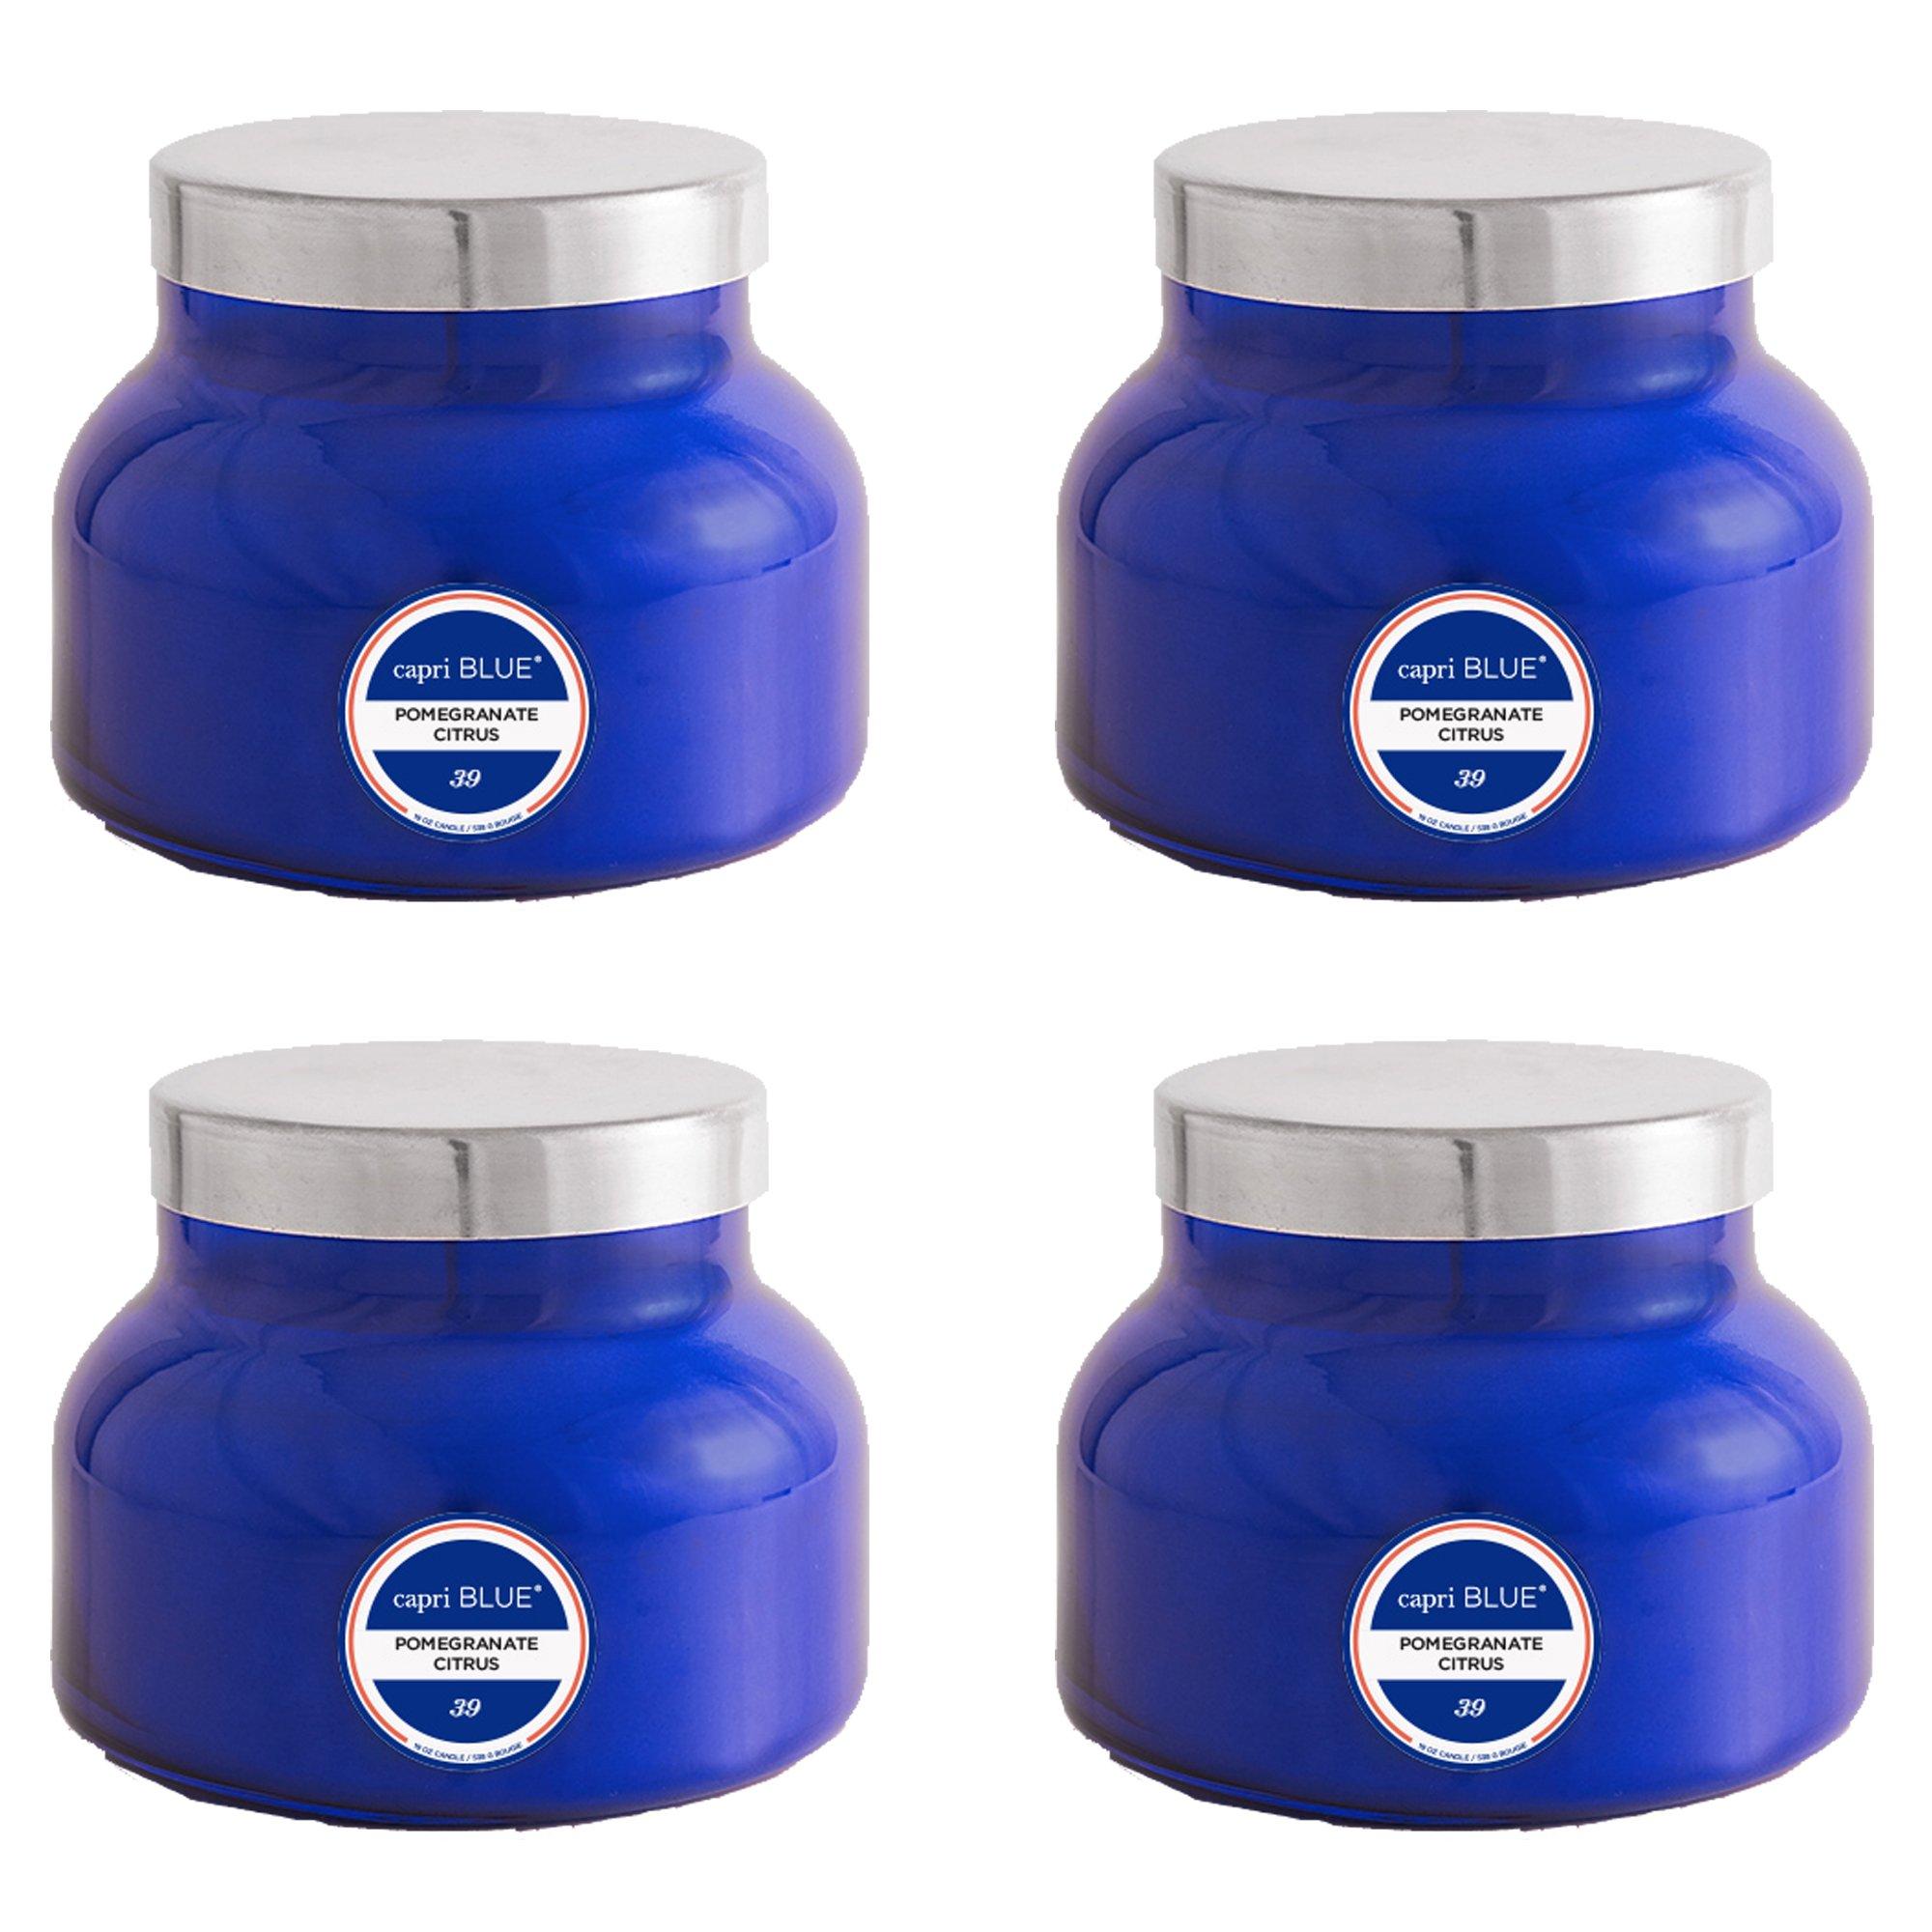 Capri Blue 19 oz Signature Pomegranate Citrus Jar Candle (4 pack), Pomegranate Citrus, One Size